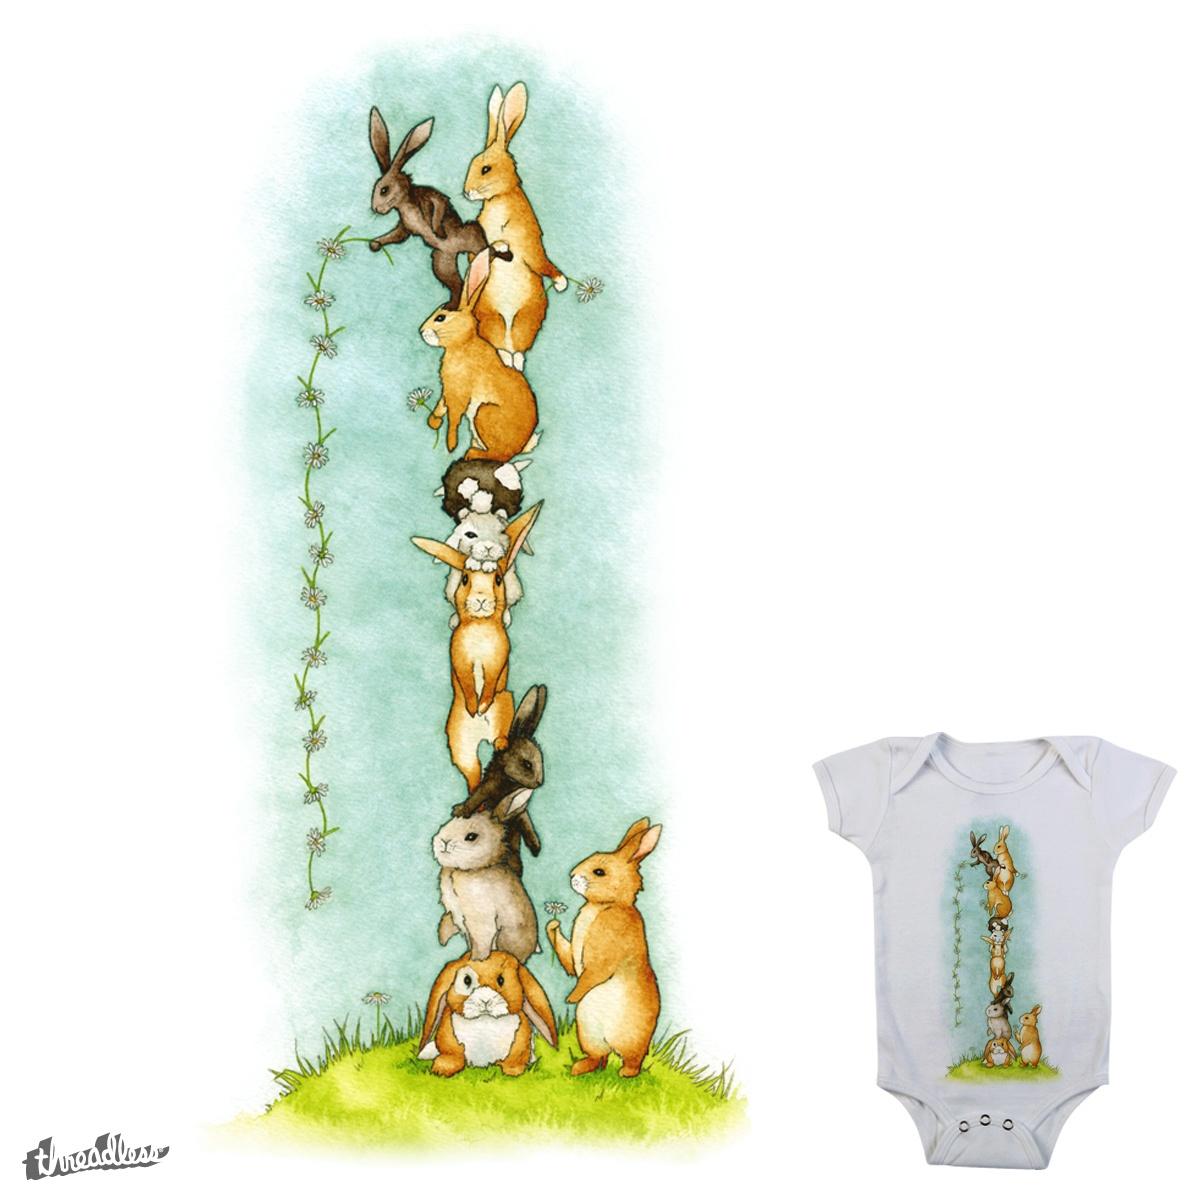 Daisy Chain by HelloLittleWolf on Threadless